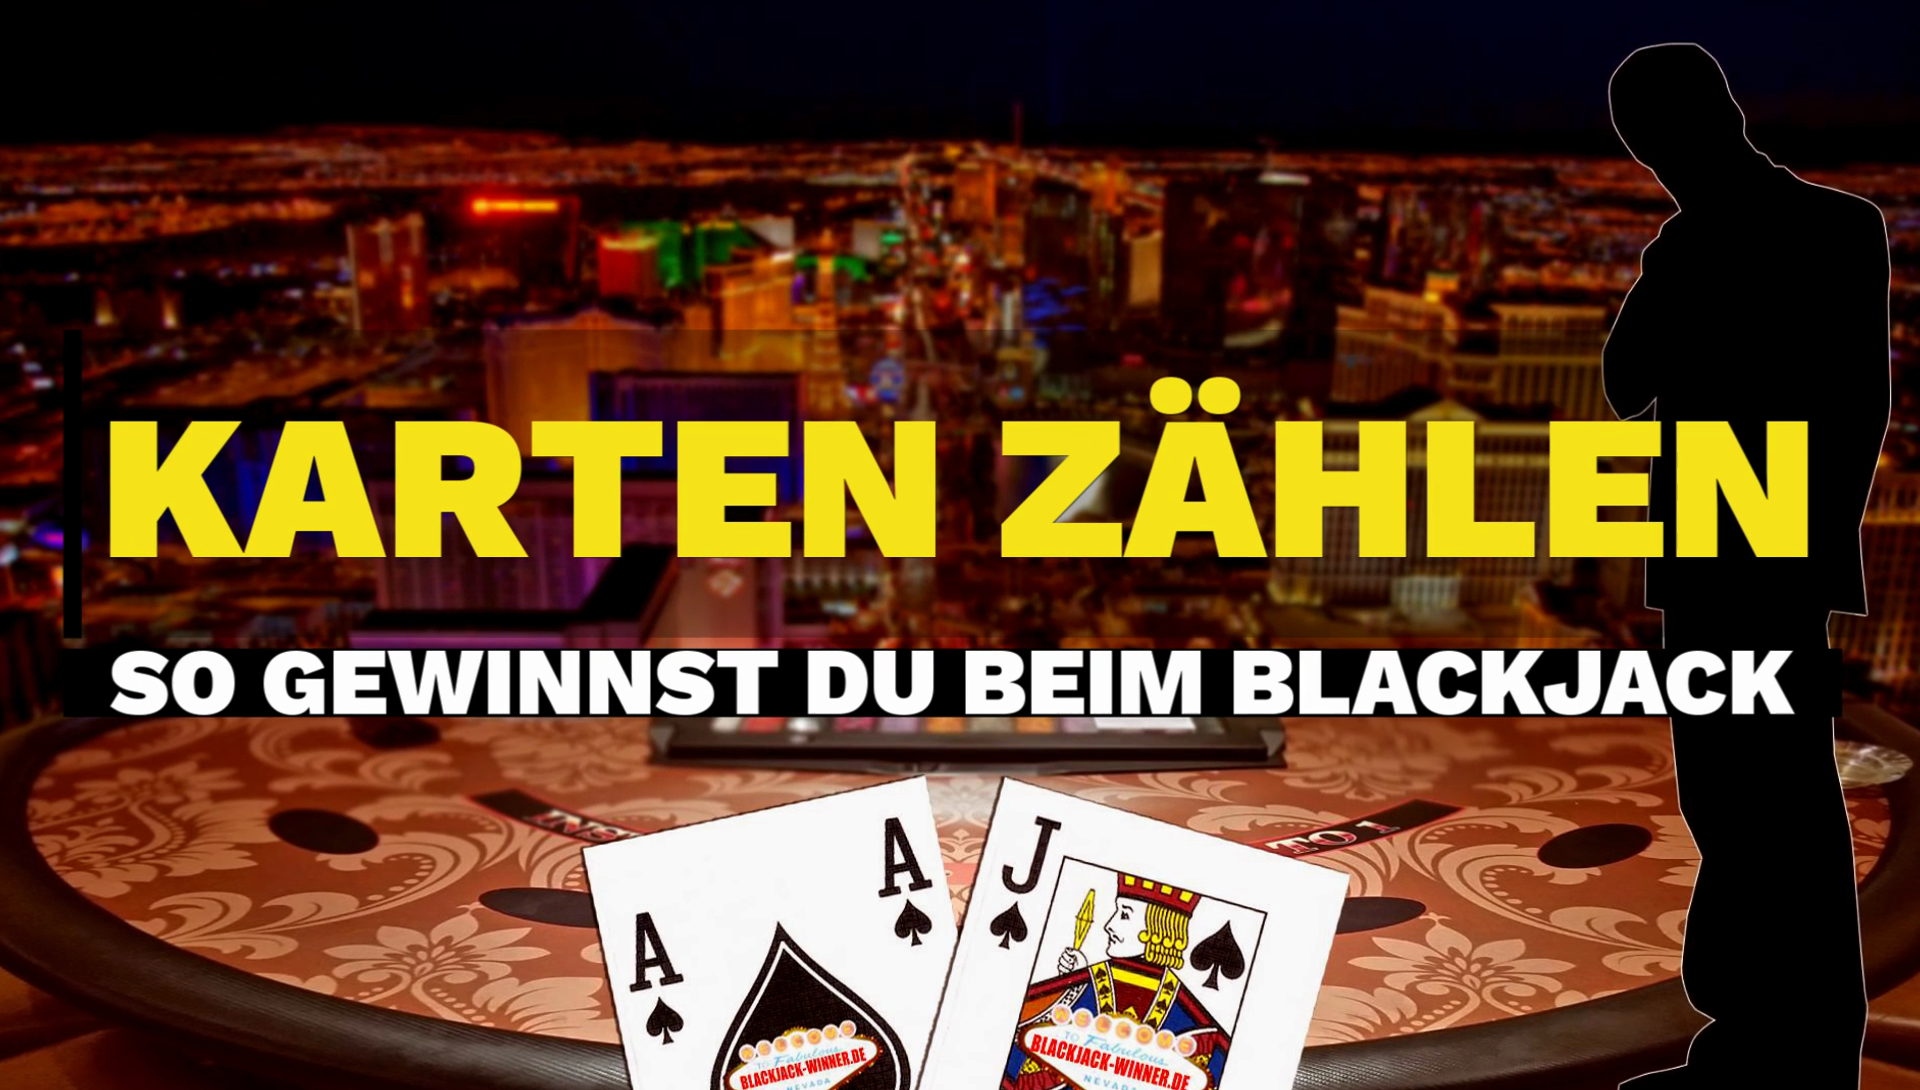 Blackjack Karten Zahlen Verboten